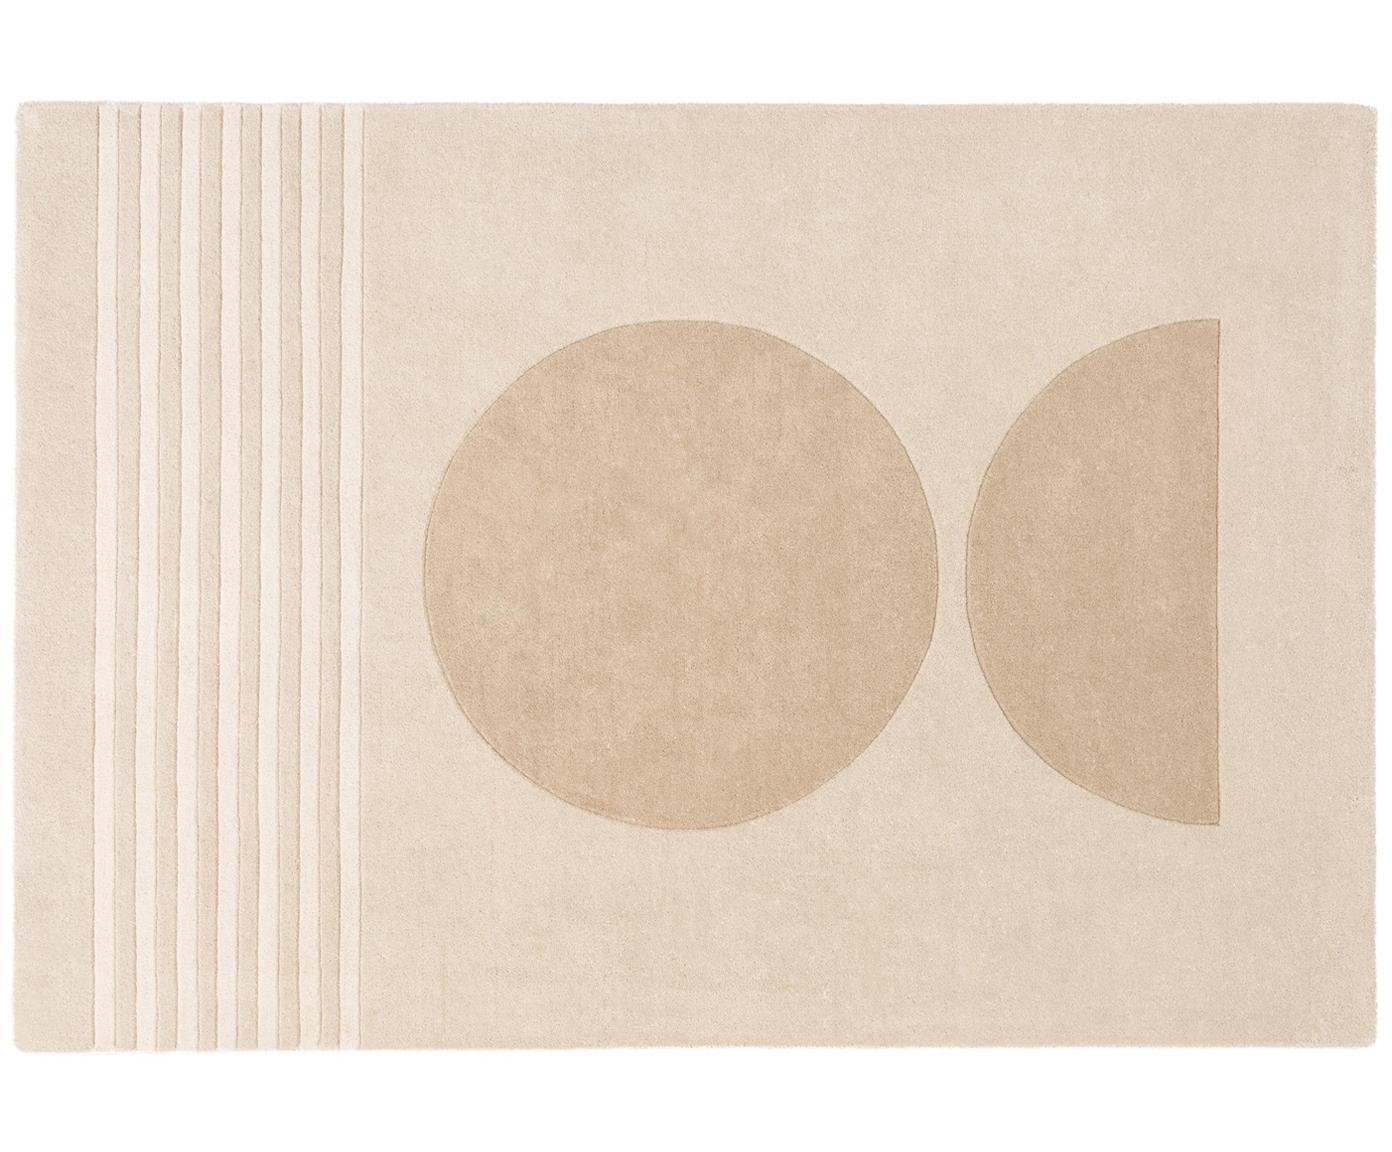 Alfombra artesanal de lana Bent, Parte superior: 100%lana, Reverso: algodón, Beige, crema, An 140 x L 200 cm (Tamaño S)